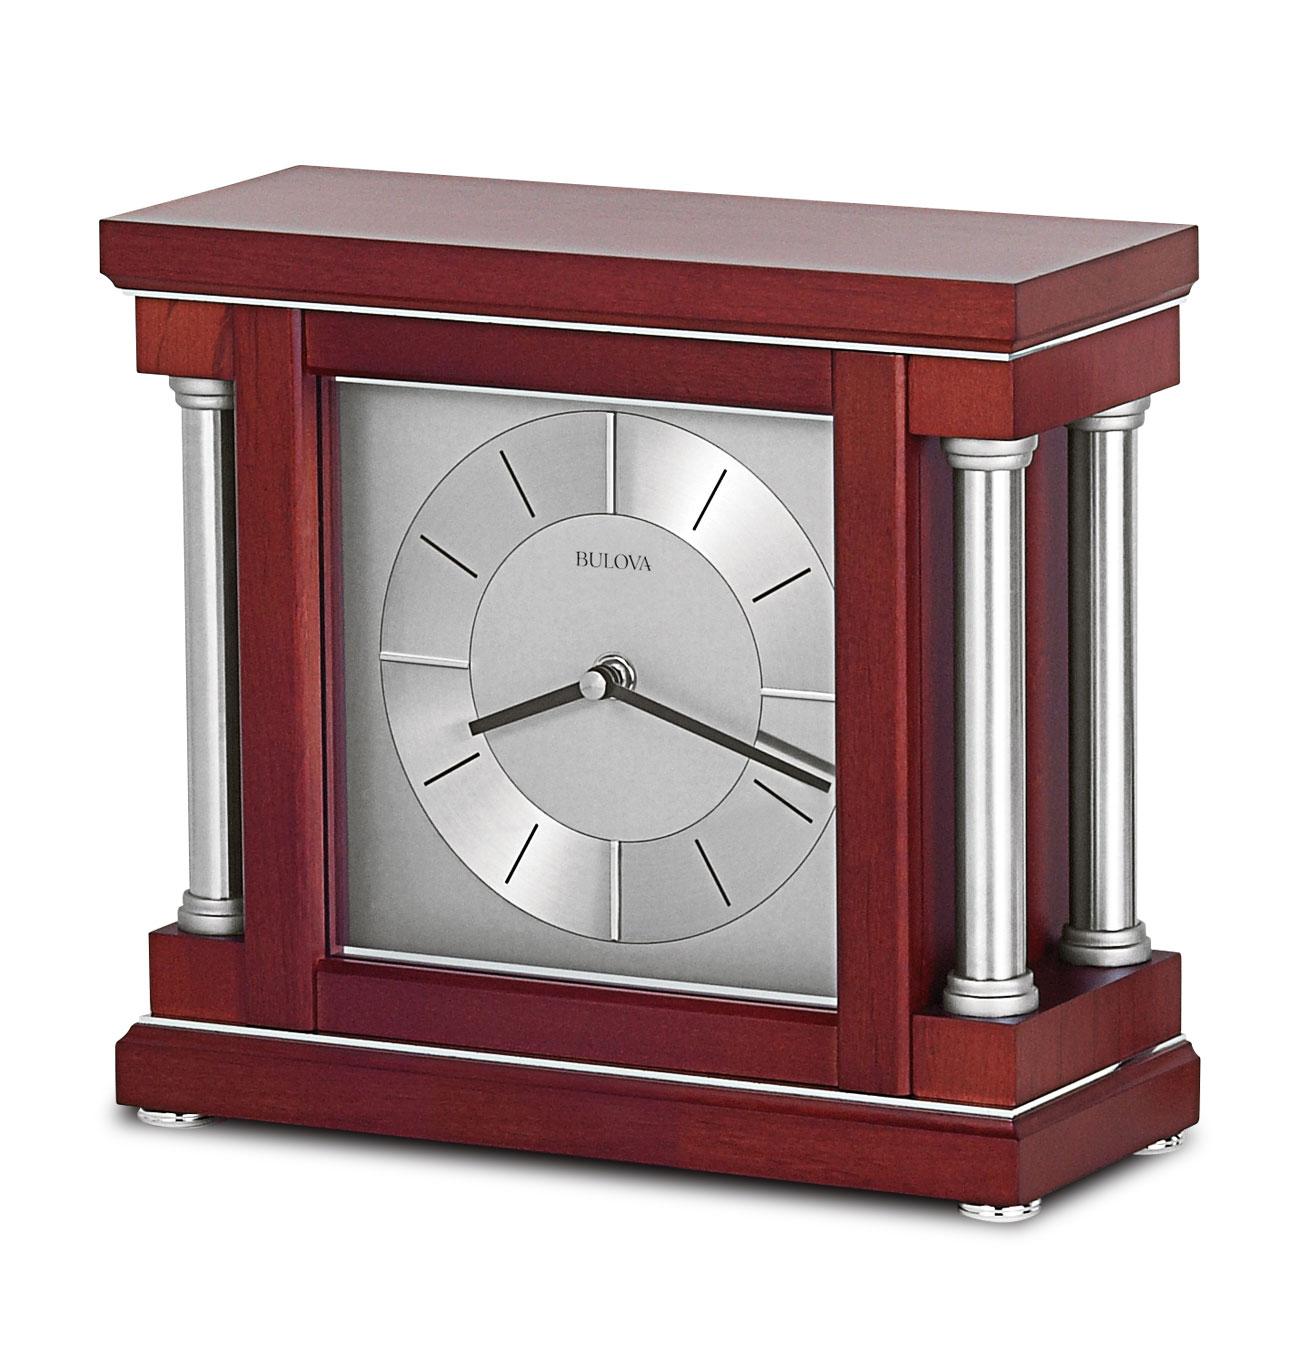 Bulova holyoke mantel clock